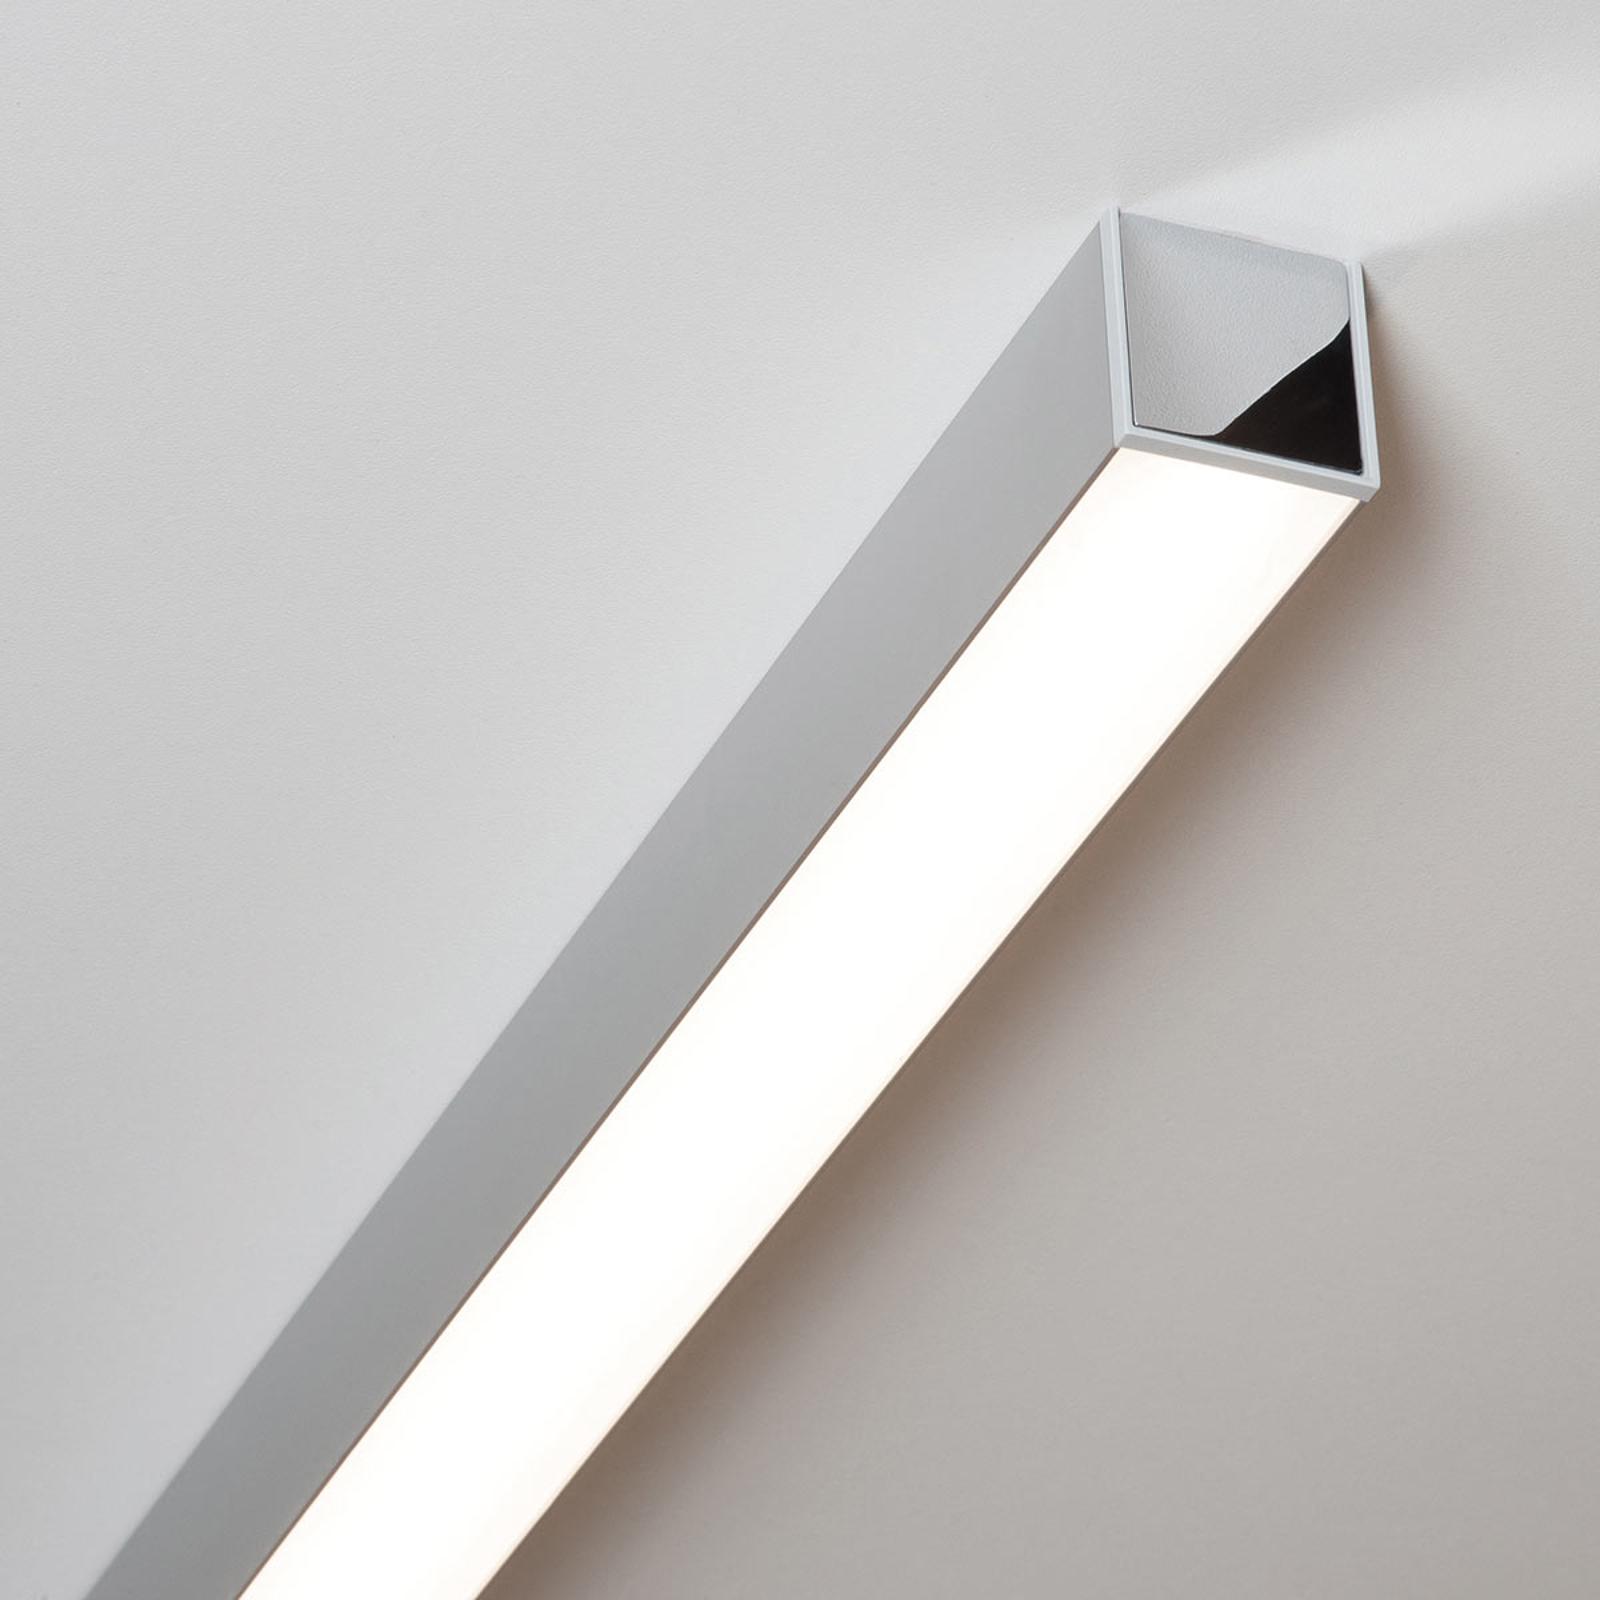 LED-kattovalaisin Ride 85,7 cm, eloksoitu alumiini